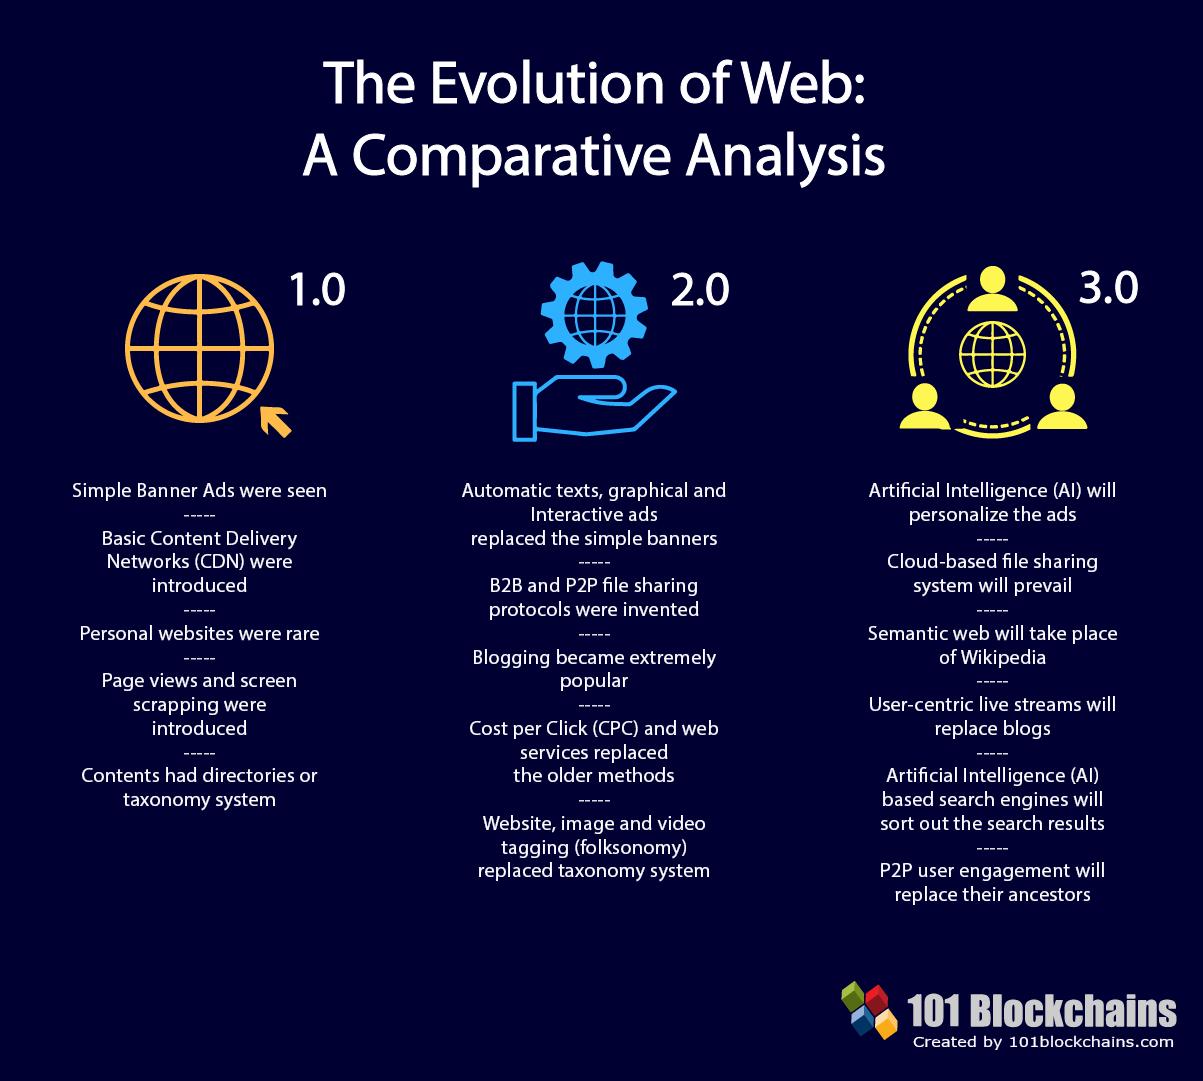 Web 3.0 vs Web 2.0 vs Web 1.0